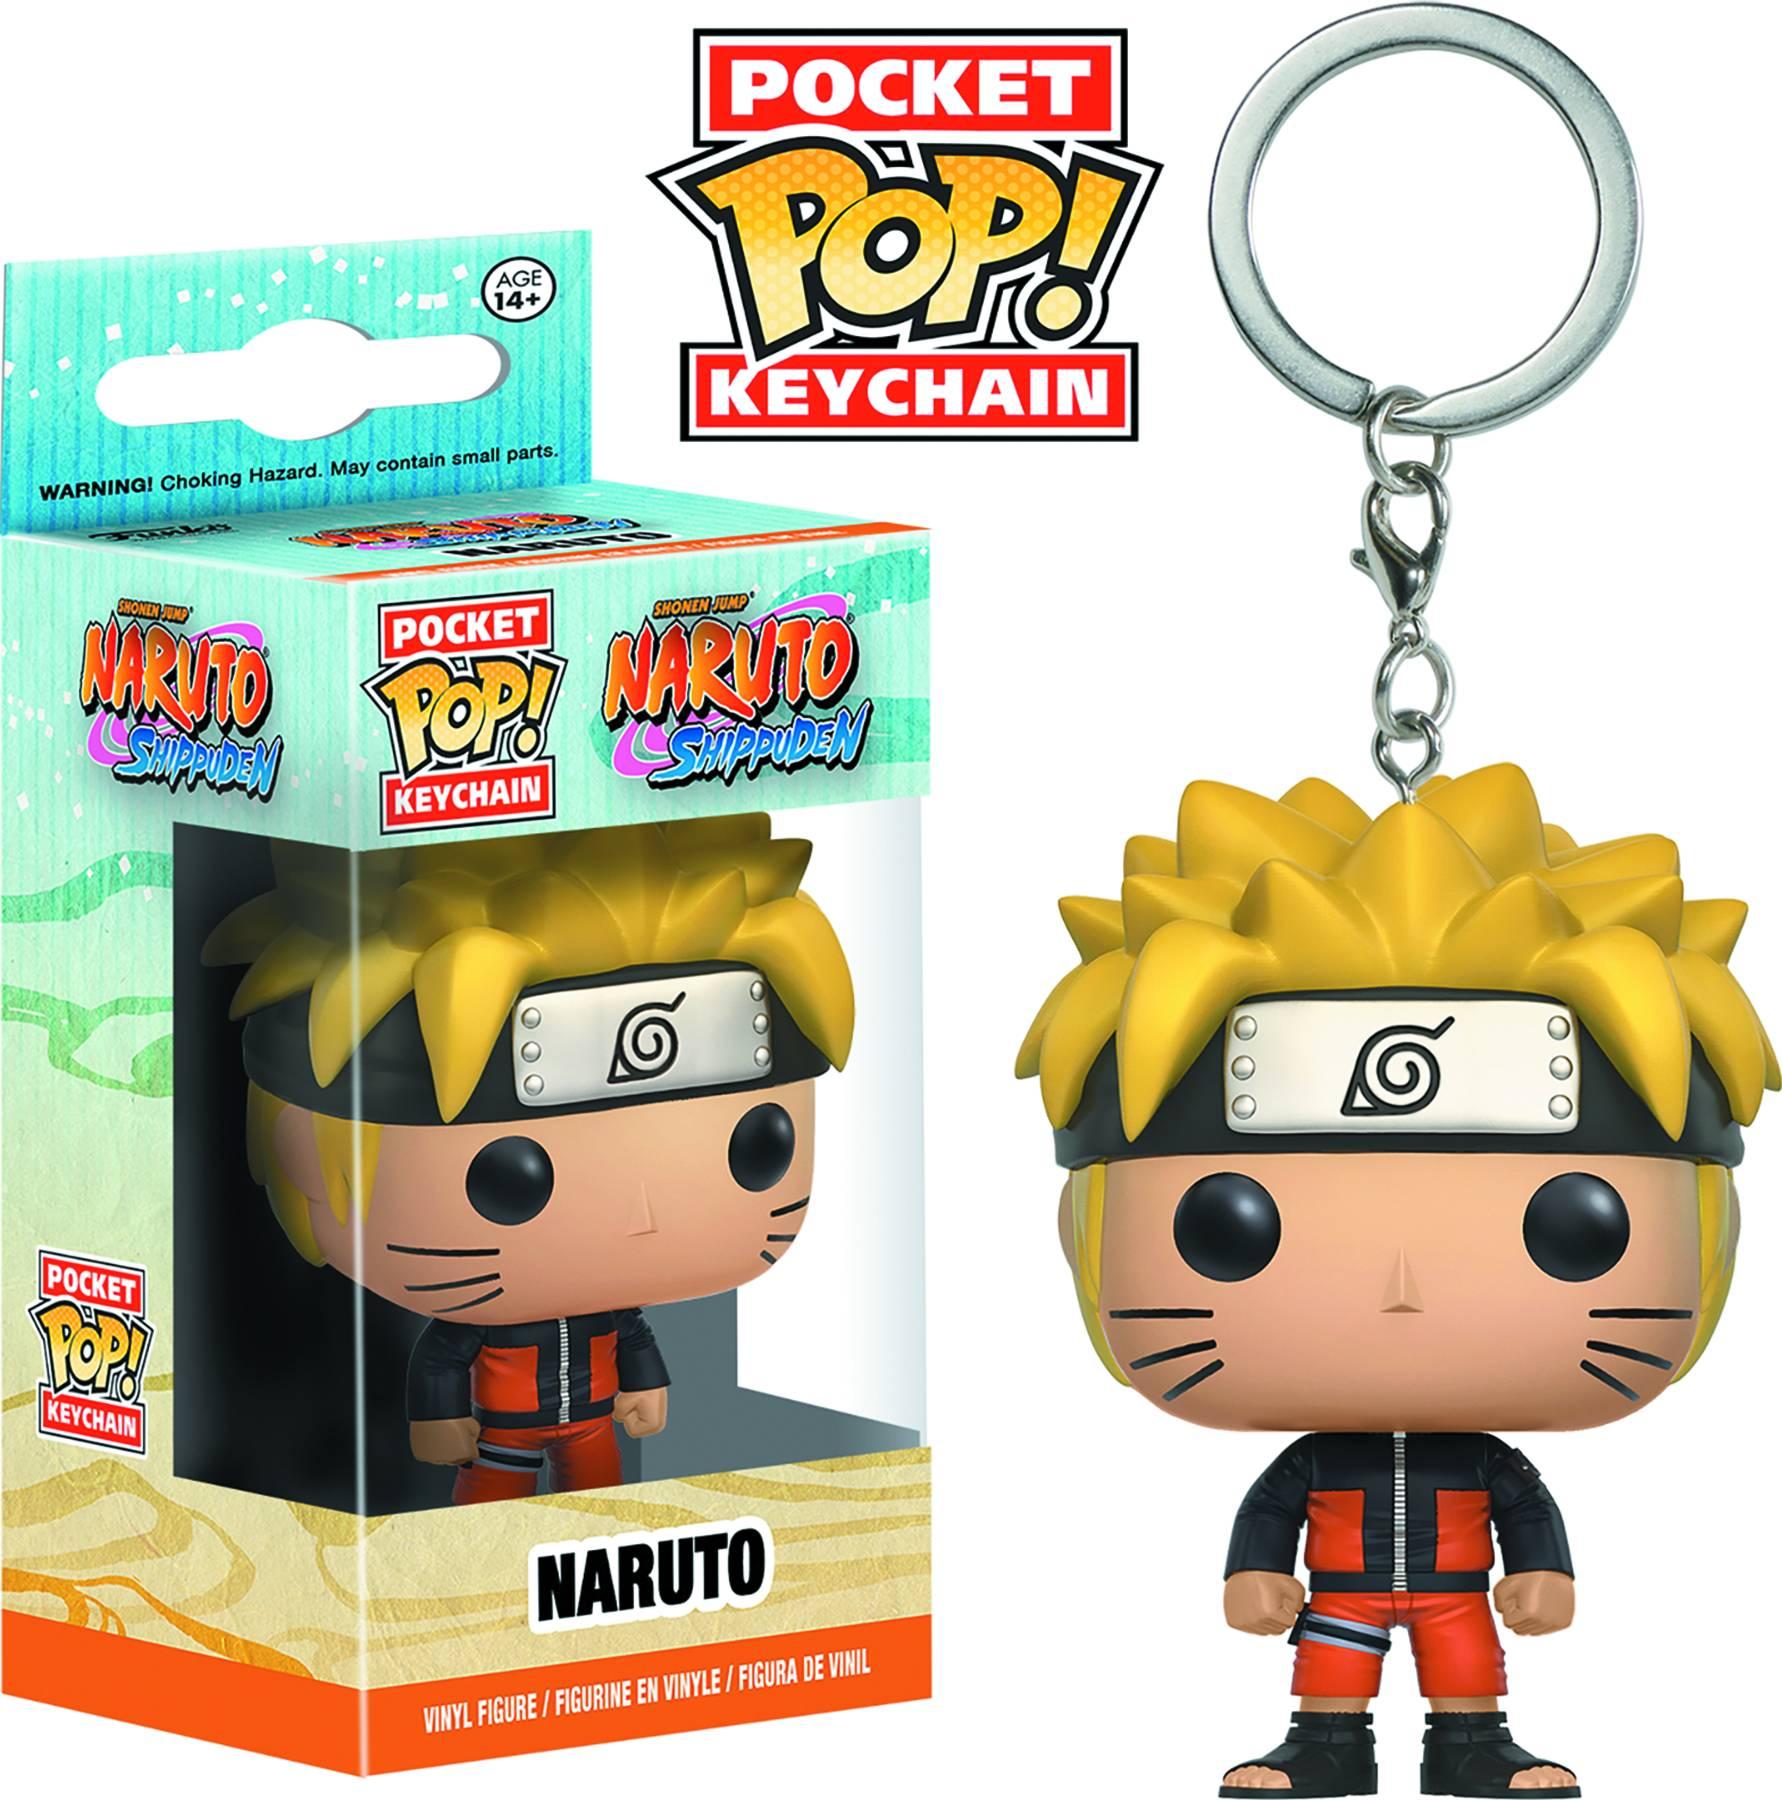 Naruto Naruto Shippuden Pocket POP Keychain 889698106634